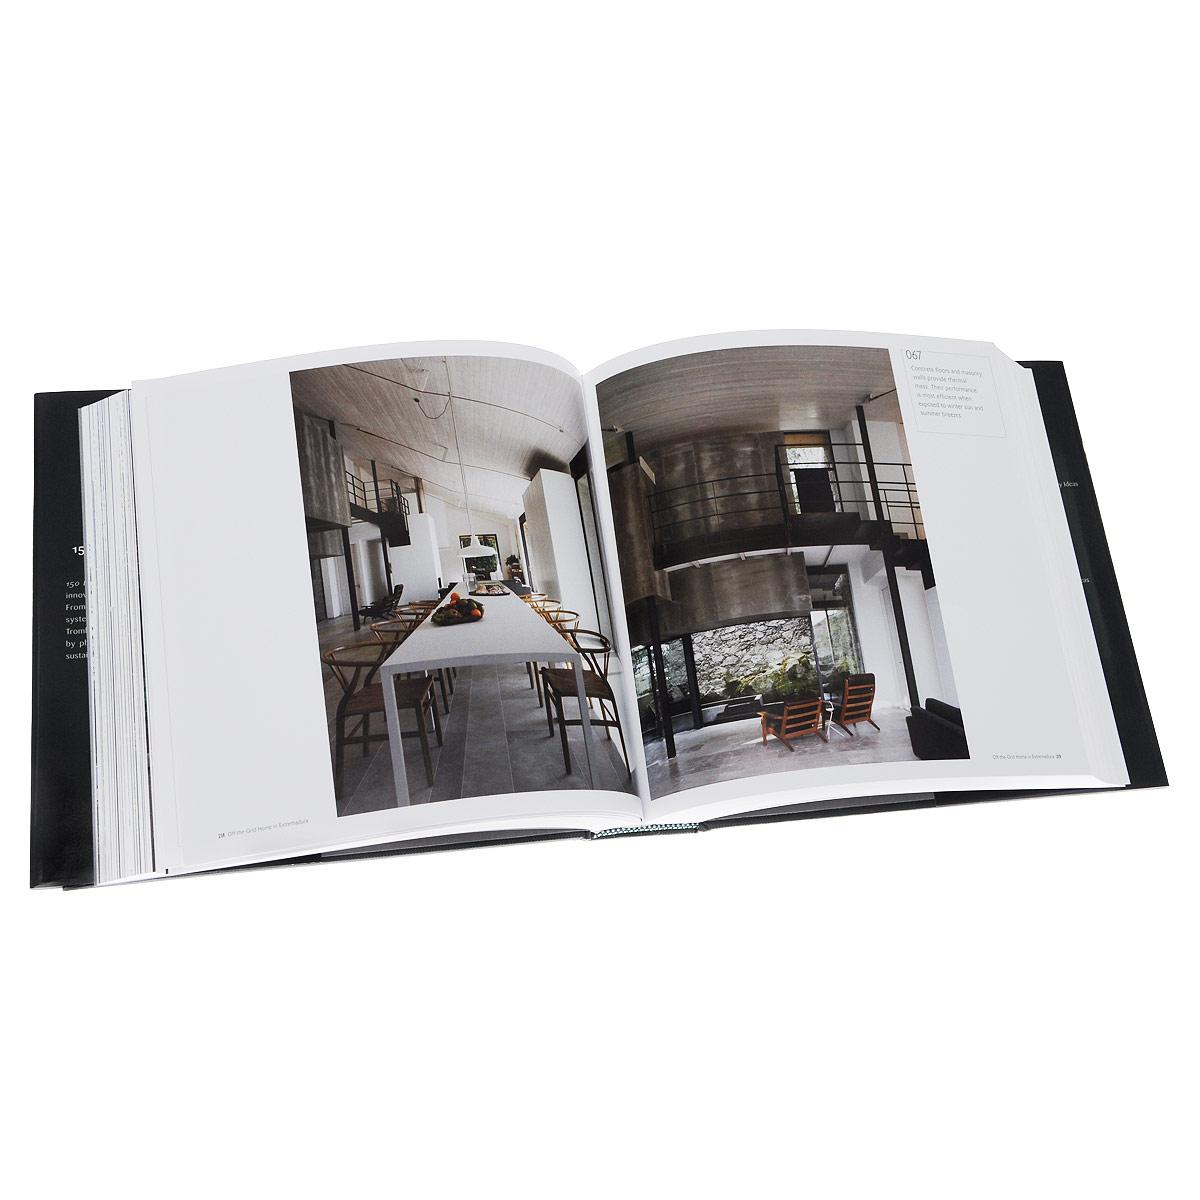 Francesc Zamora Mola. 150 Best Sustainable House Ideas